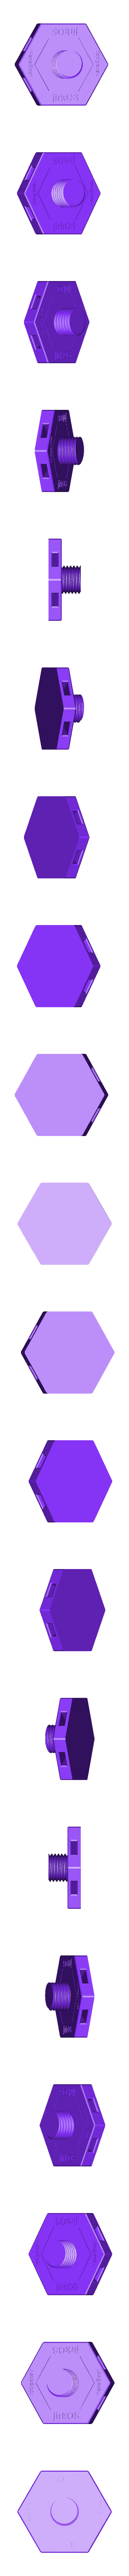 hexaspot_arm_base.stl Download free STL file HexaSpot Lamp v1 • 3D printing object, marigu